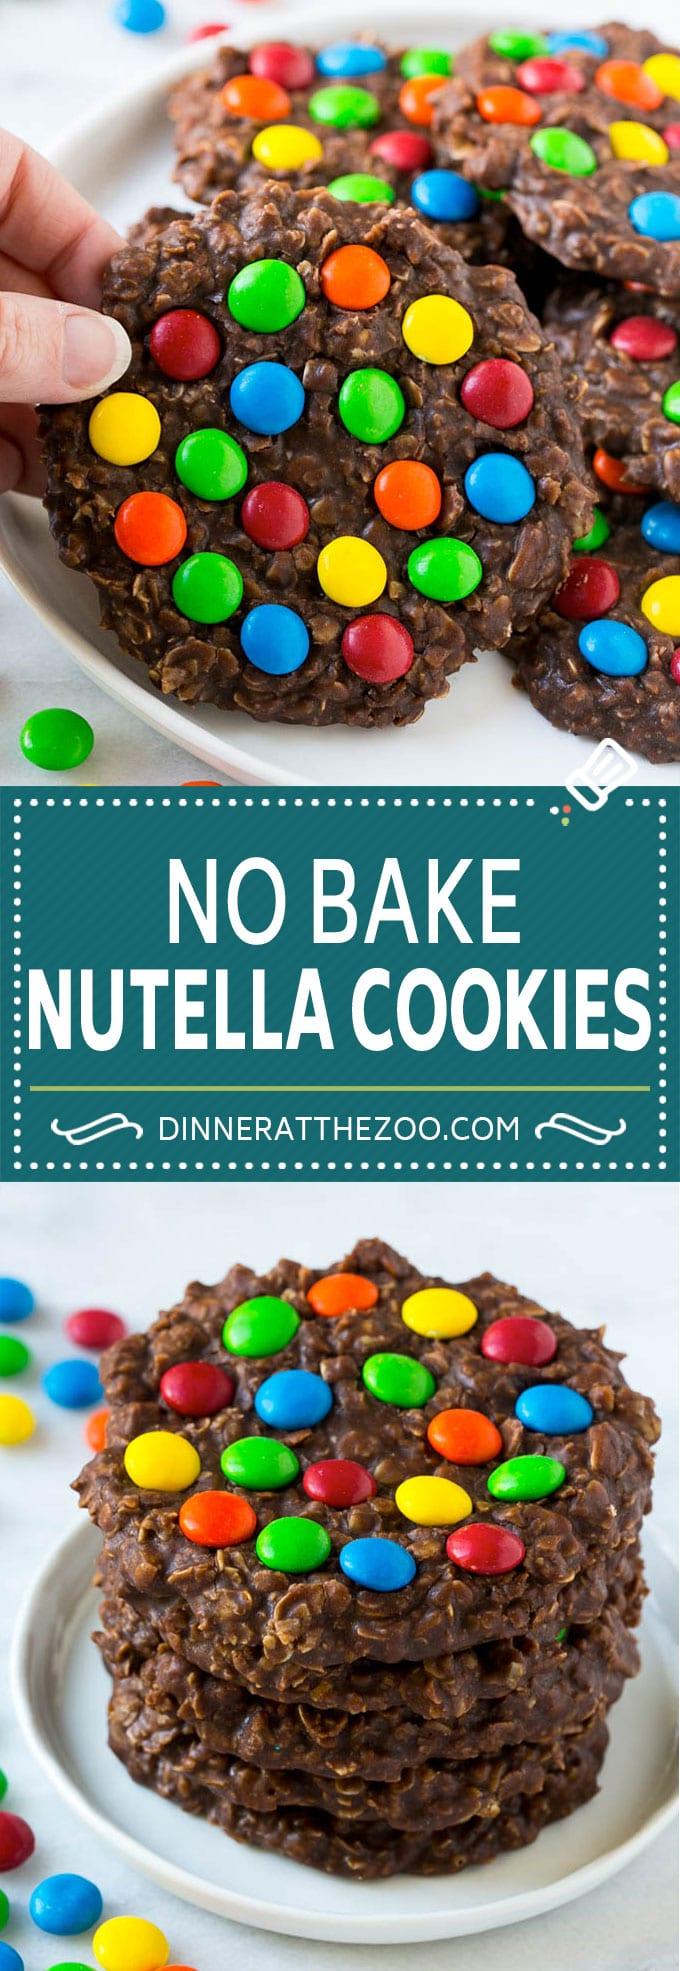 No Bake Nutella Cookies | No Bake Cookie Recipe | M&M's Cookies | Chocolate Oatmeal Cookies #cookies #nutella #chocolate #dessert #dinneratthezoo